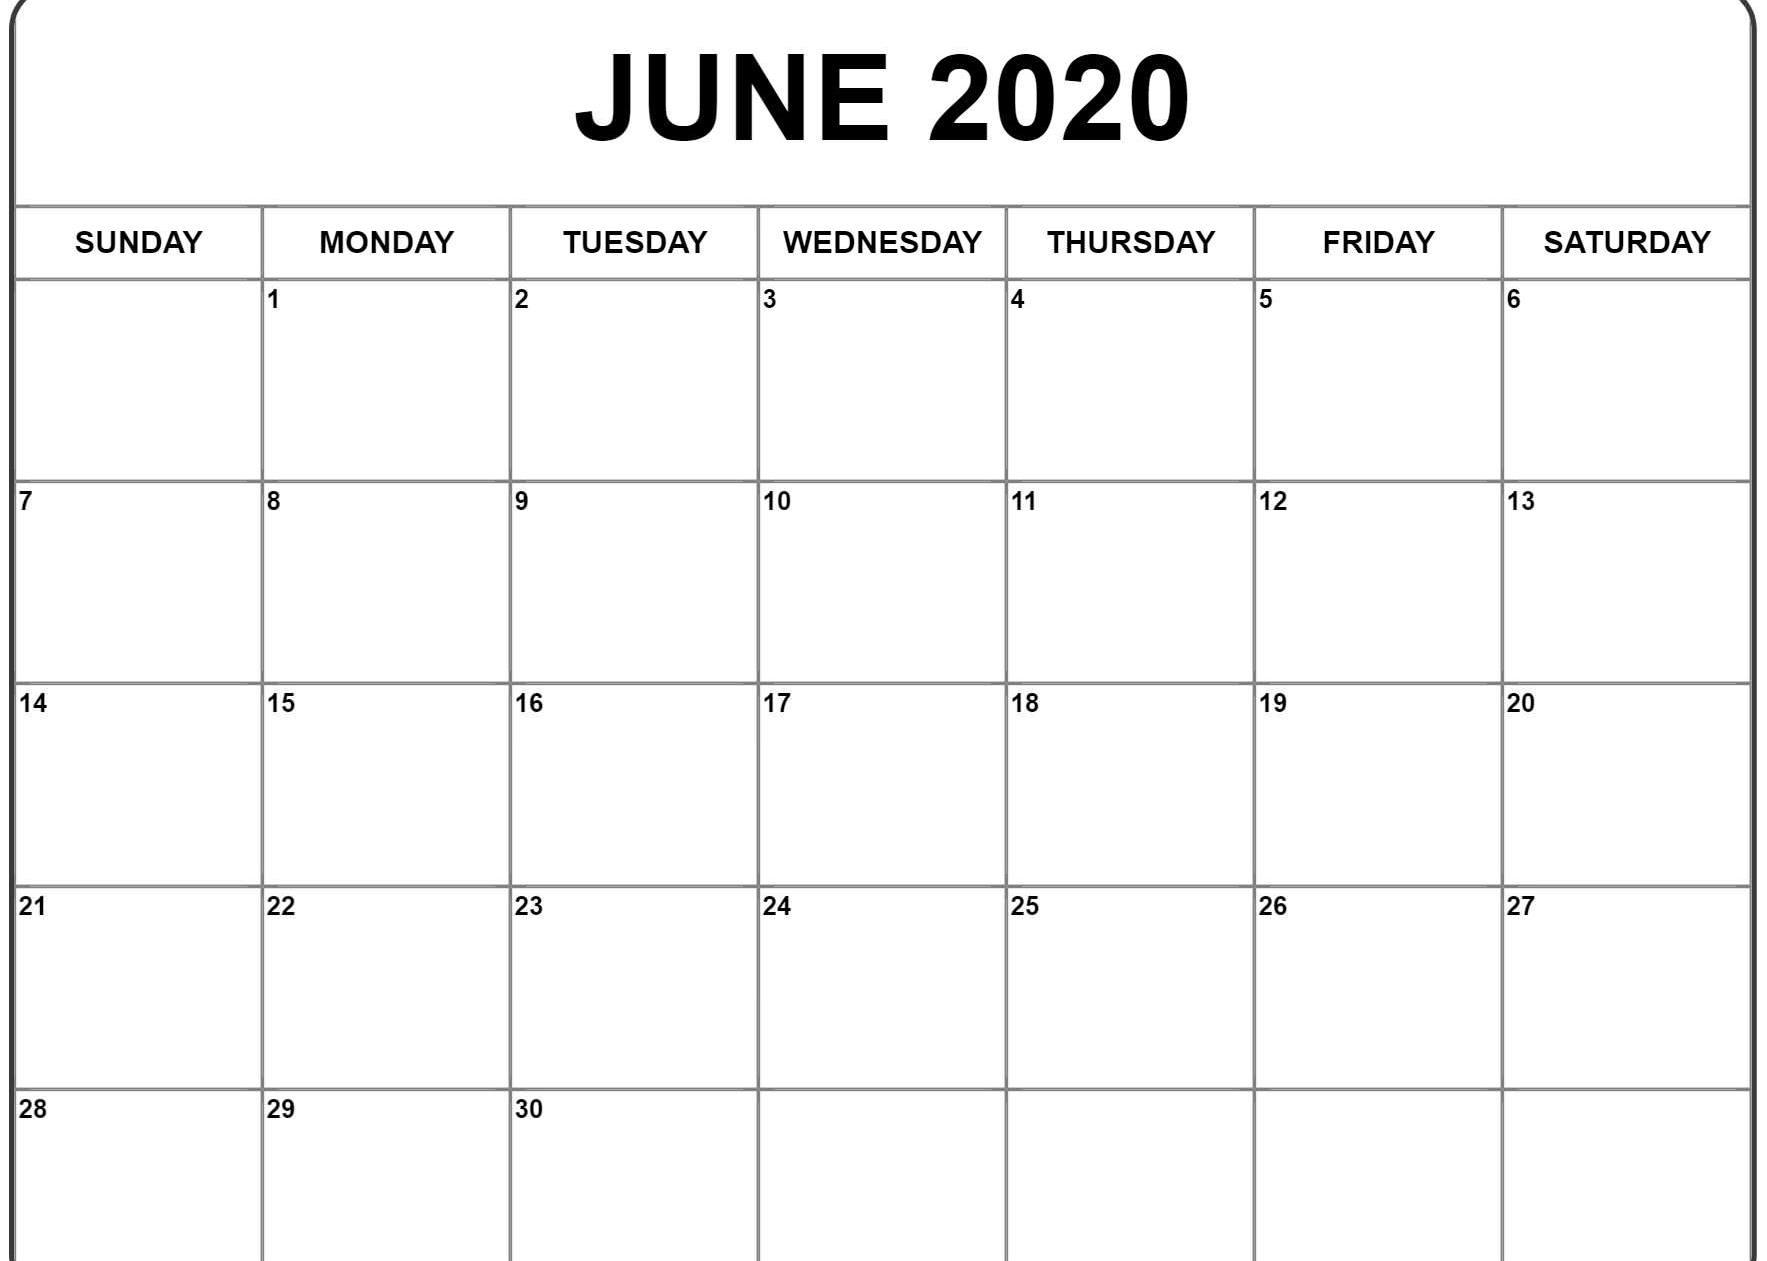 June 2020 Calendar Pdf, Word, Excel Template